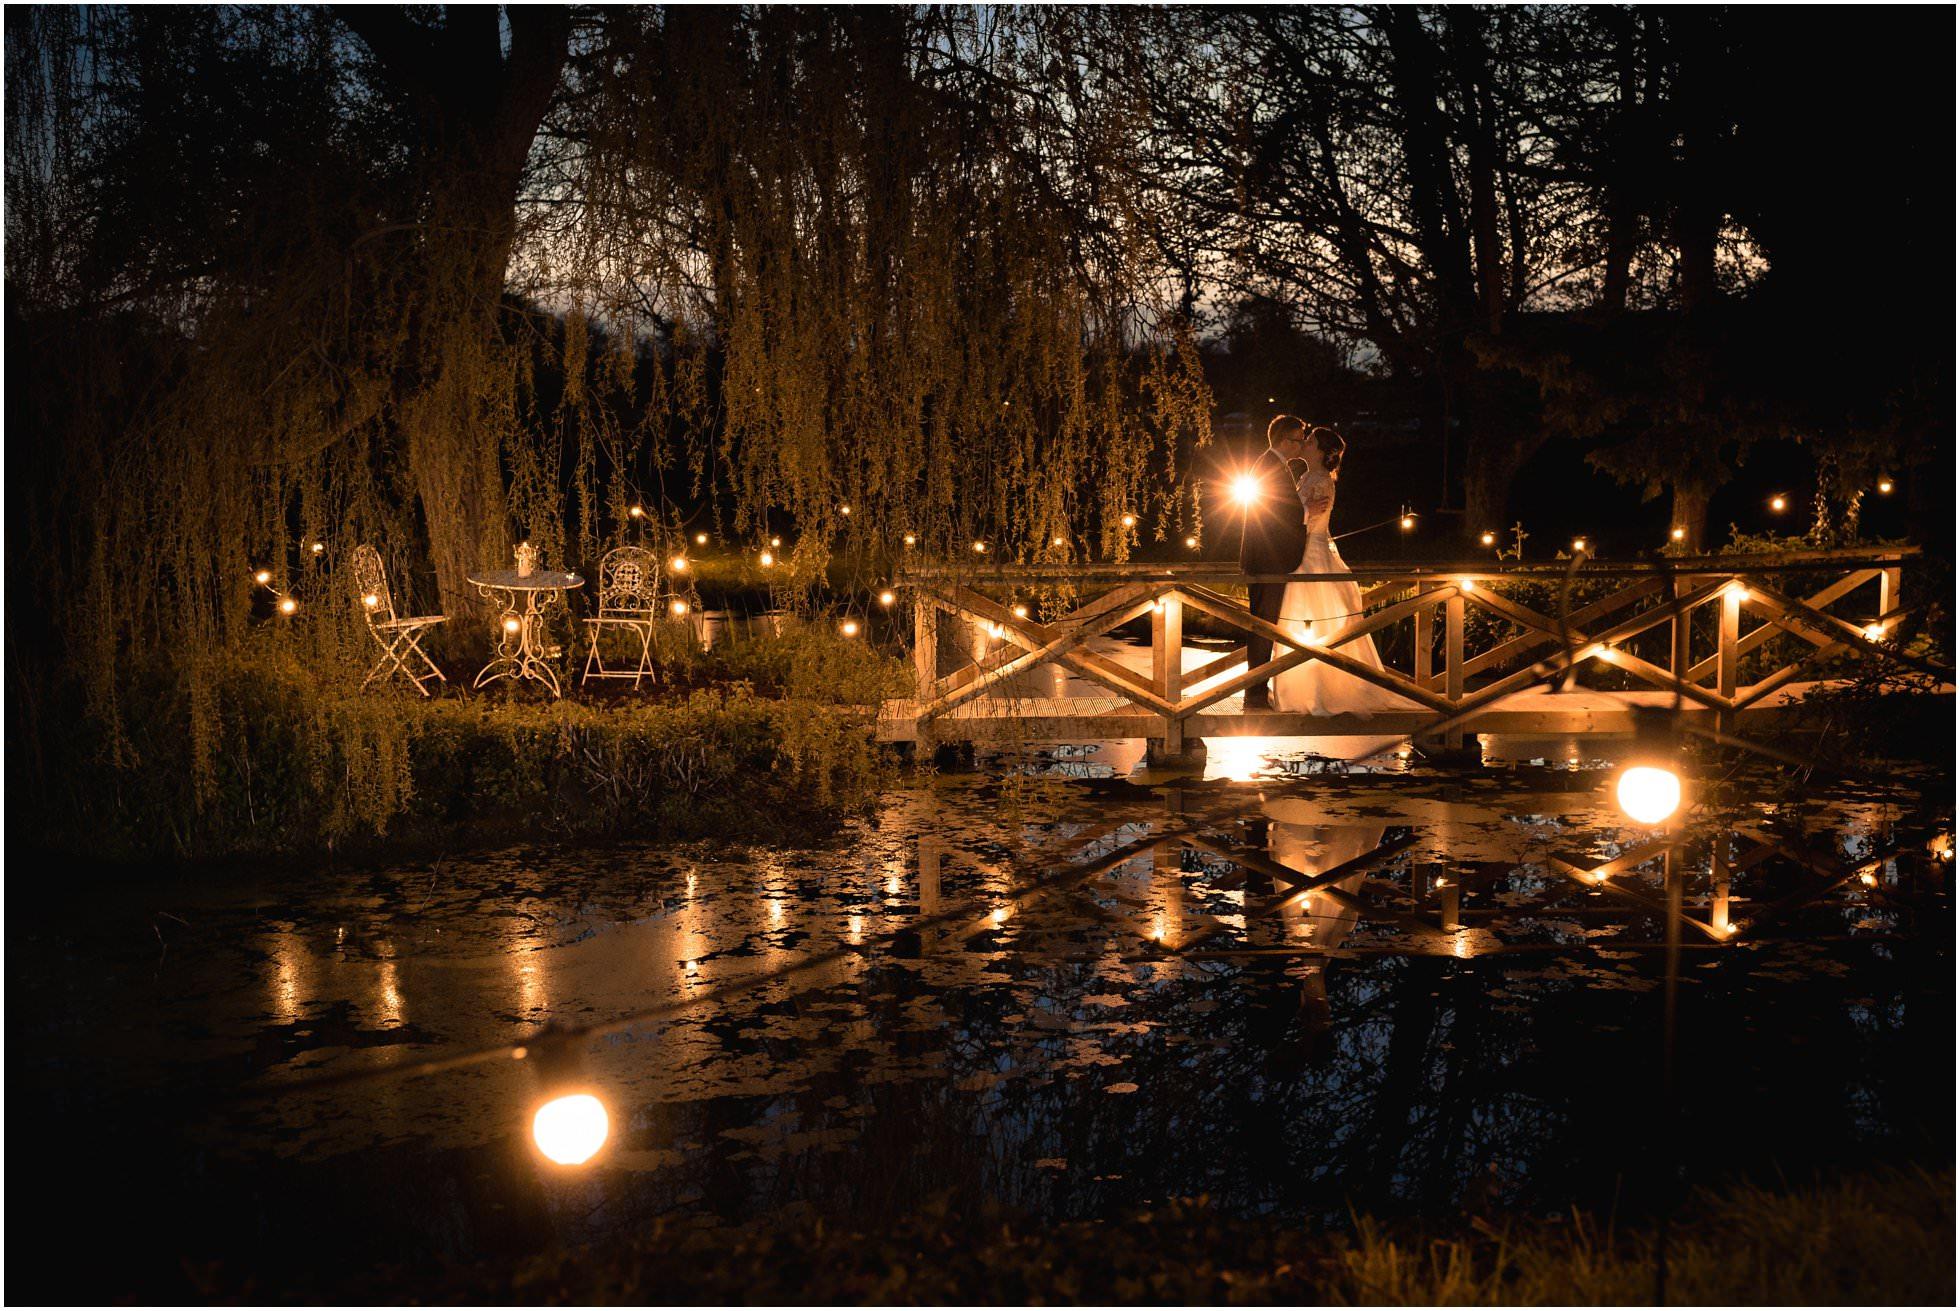 The Mill, York Wedding Venue, a photographer's dream venue!